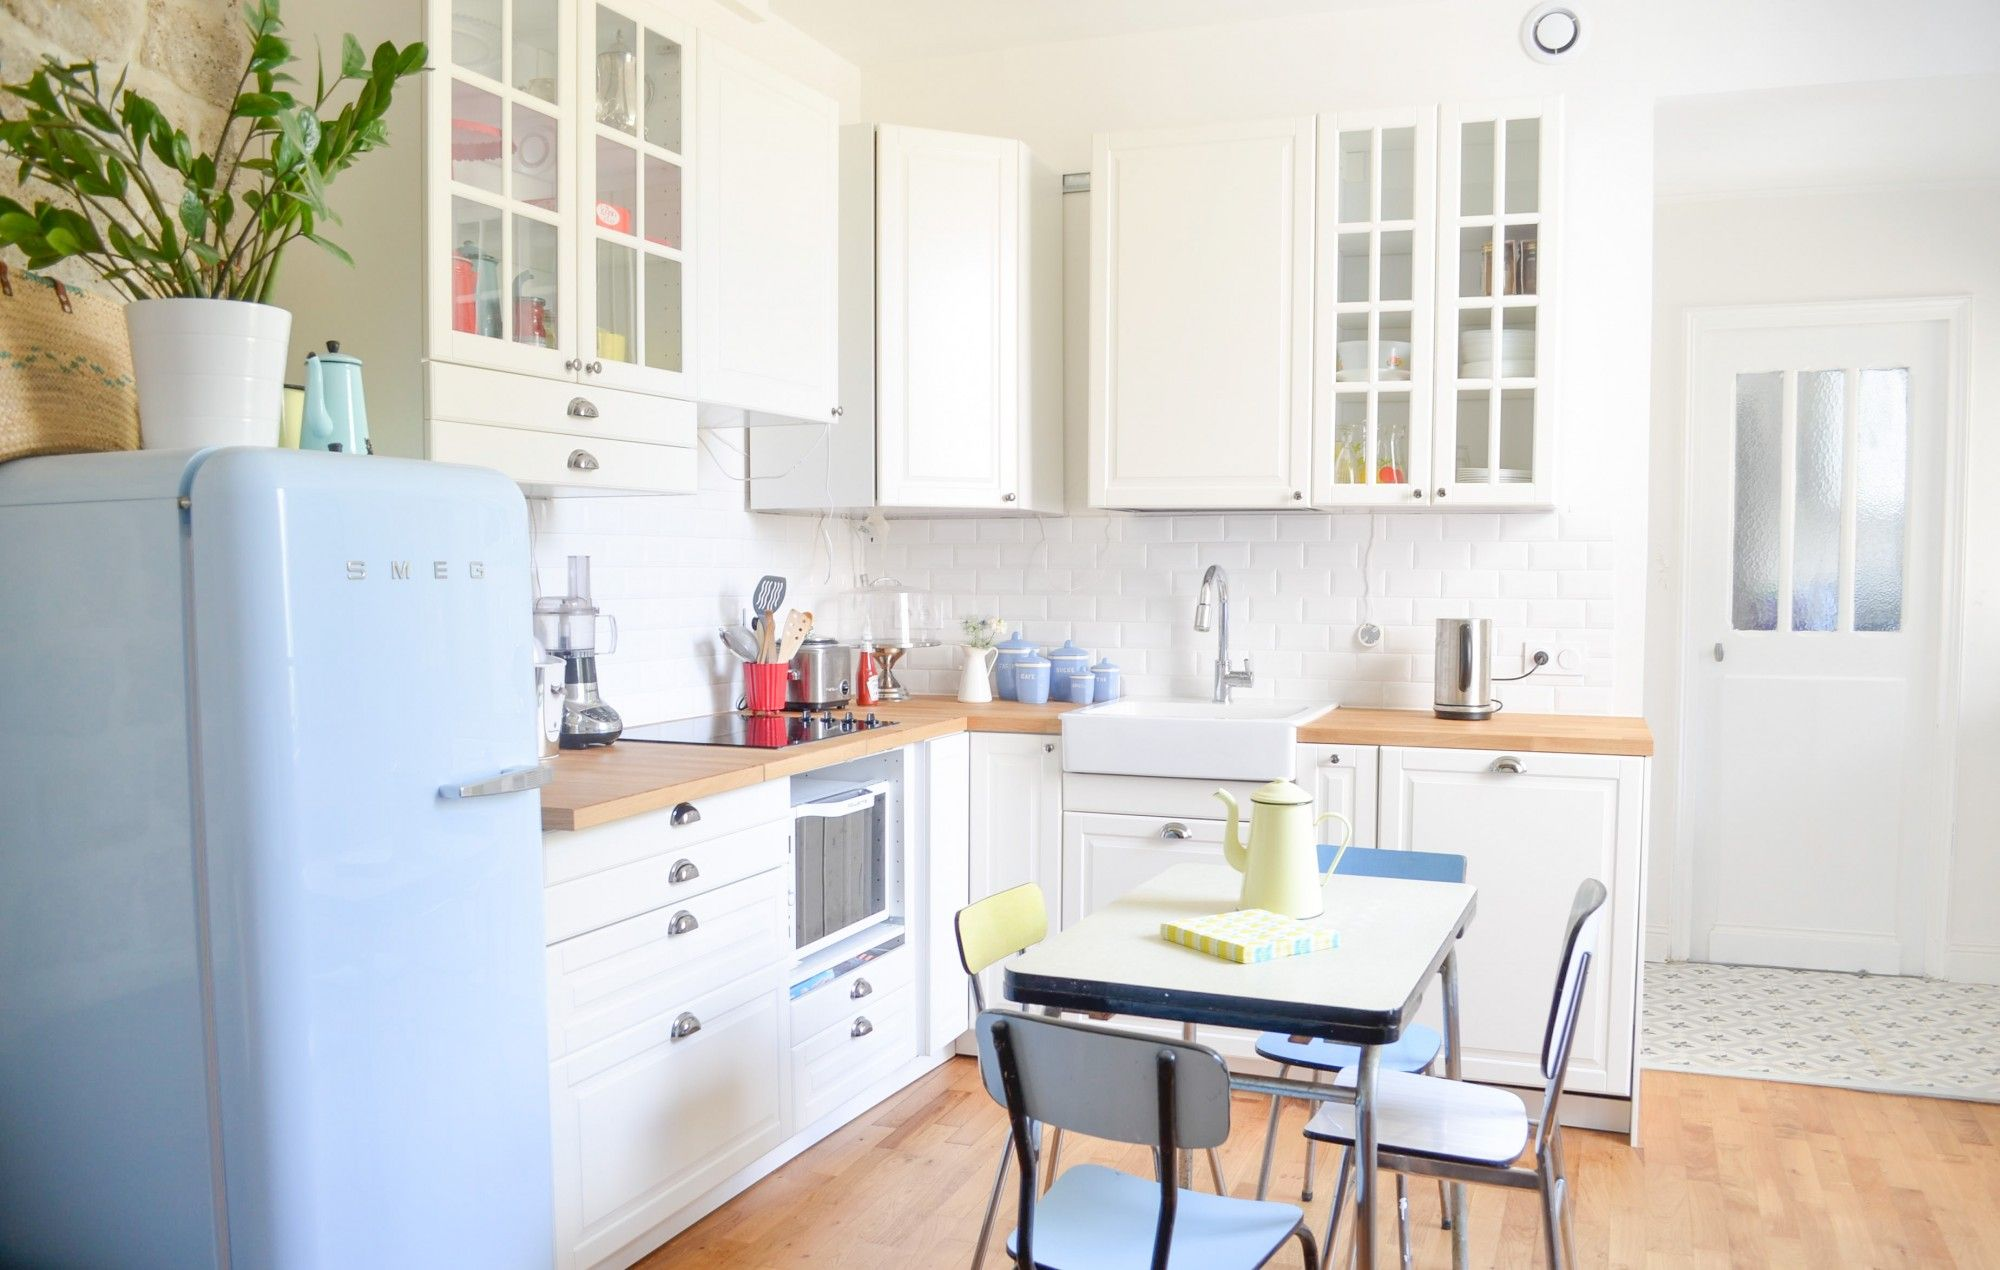 Cuisine Ikea Metod BODBYN Montage Smeg Bleu Ciel Placard Dangle - Meuble angle ikea cuisine pour idees de deco de cuisine